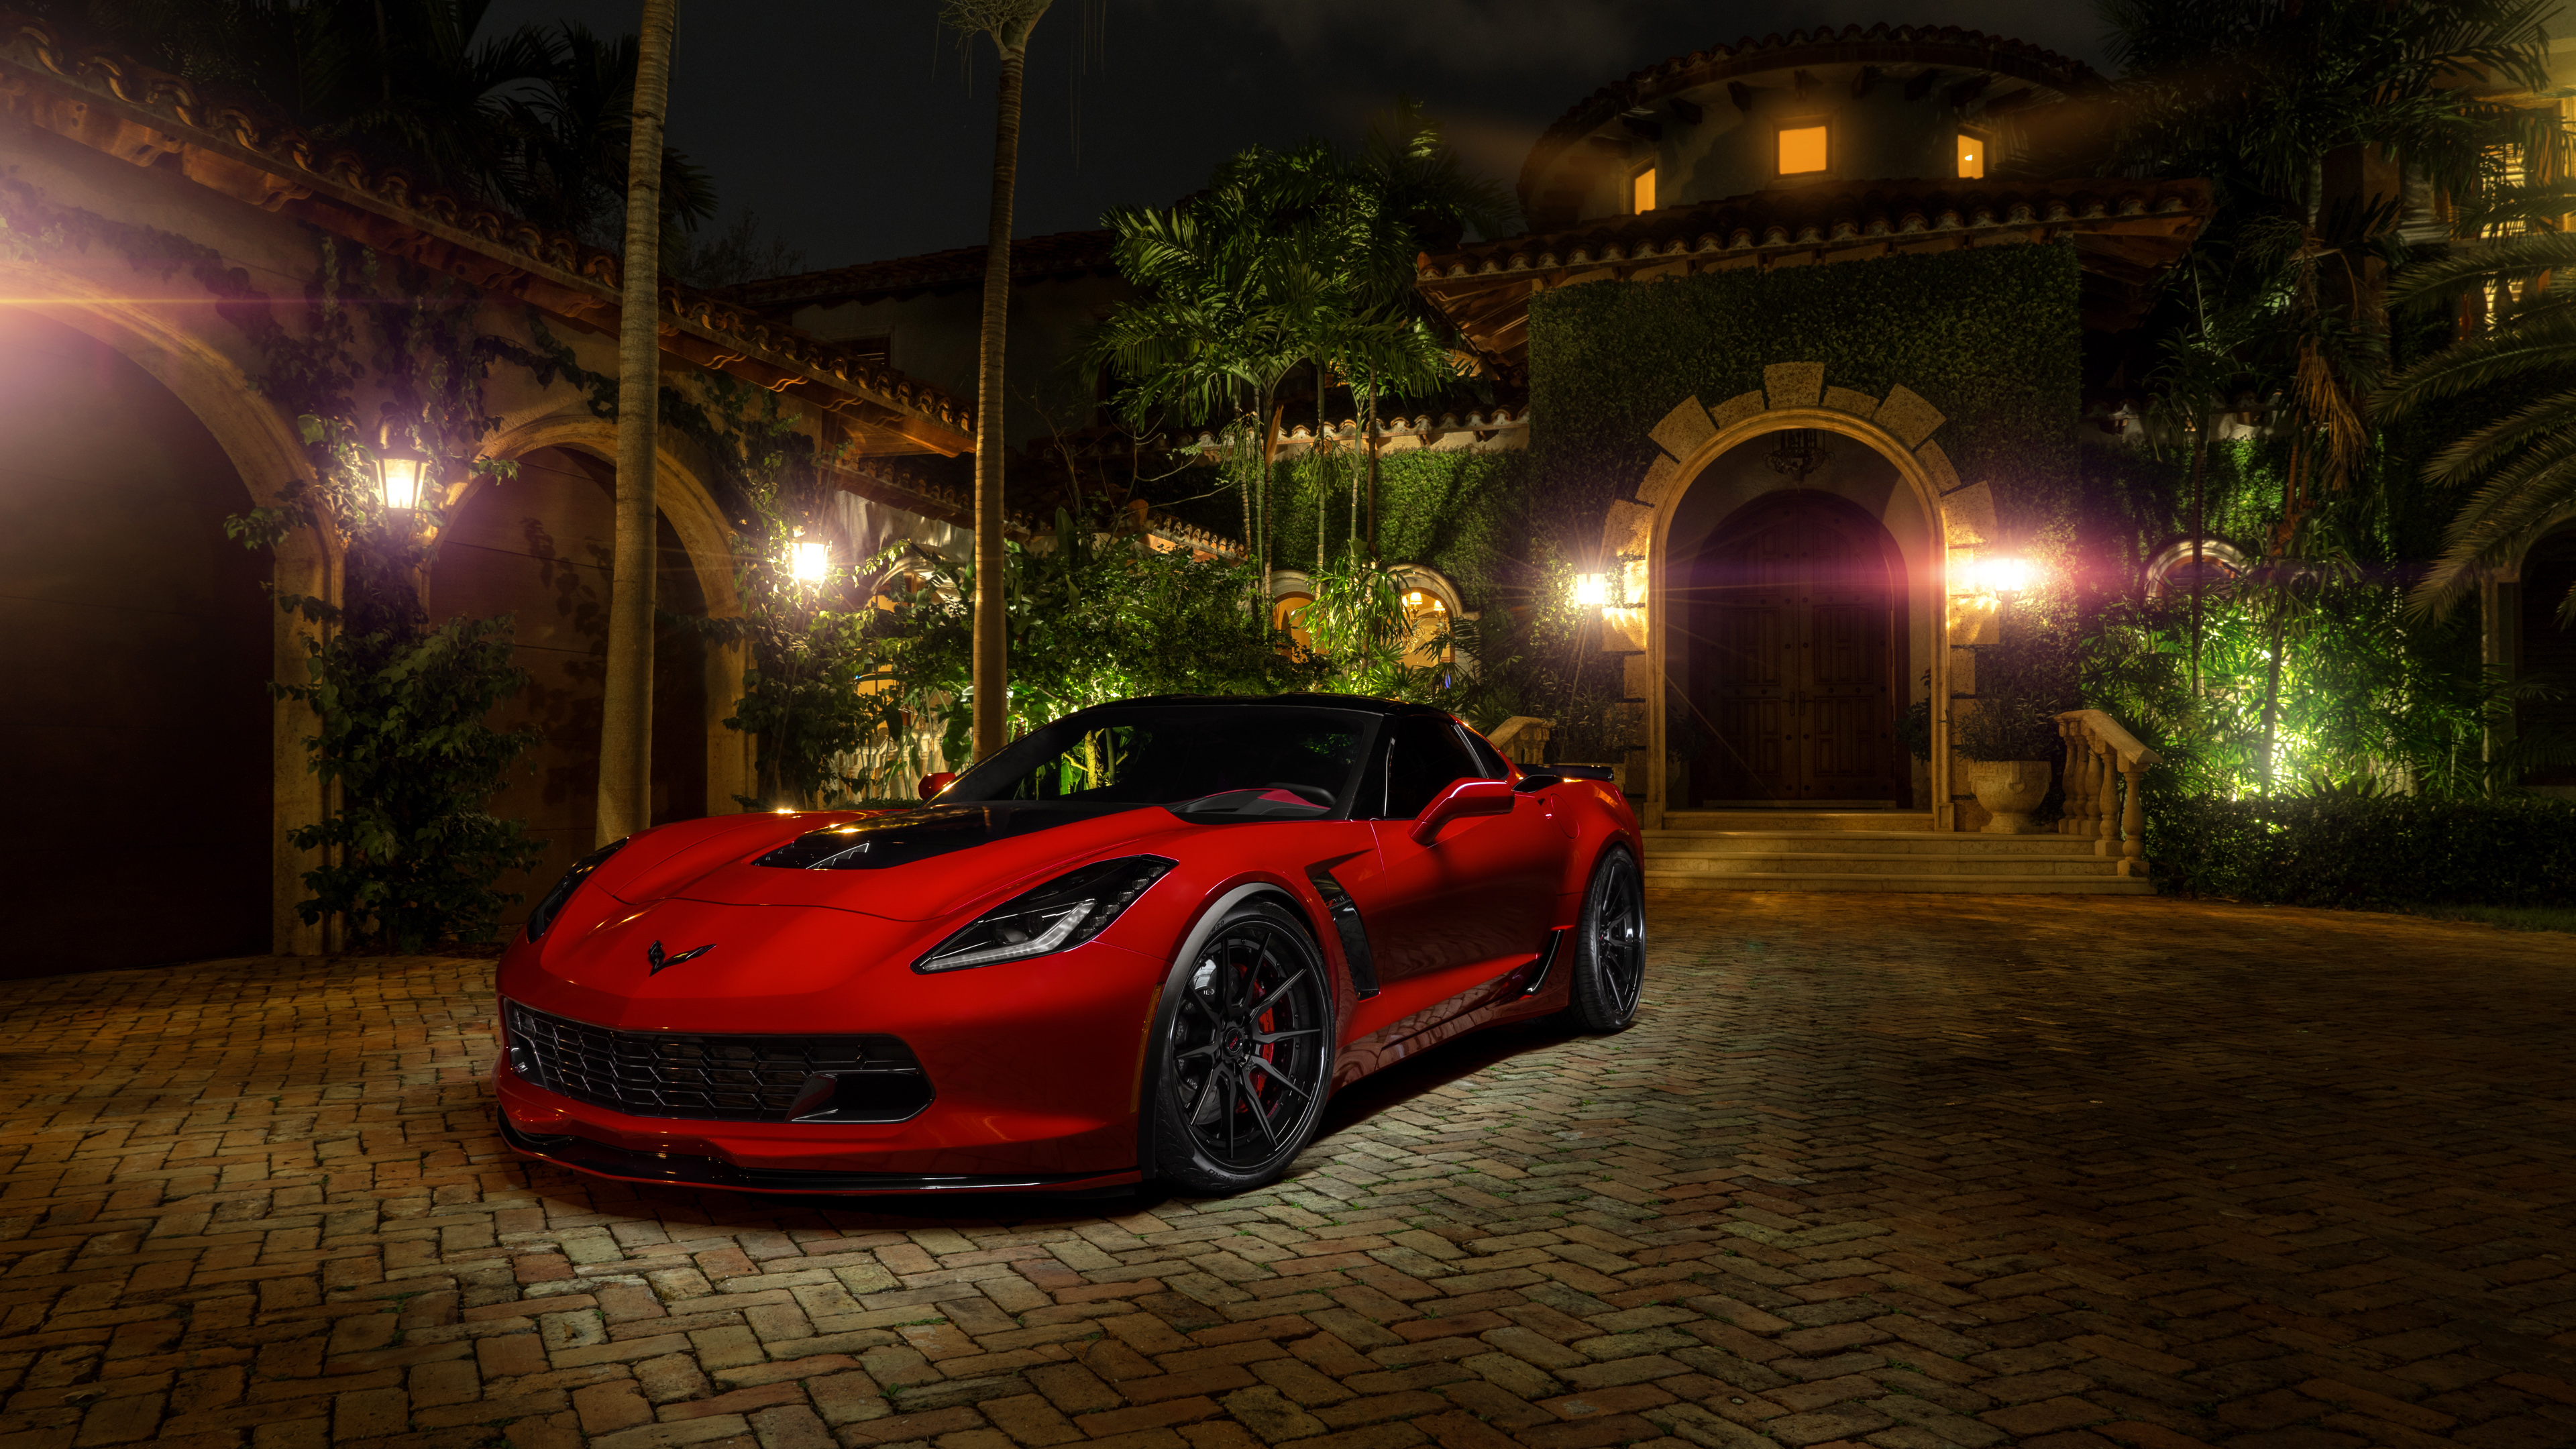 Corvette Wallpaper 3840x2160